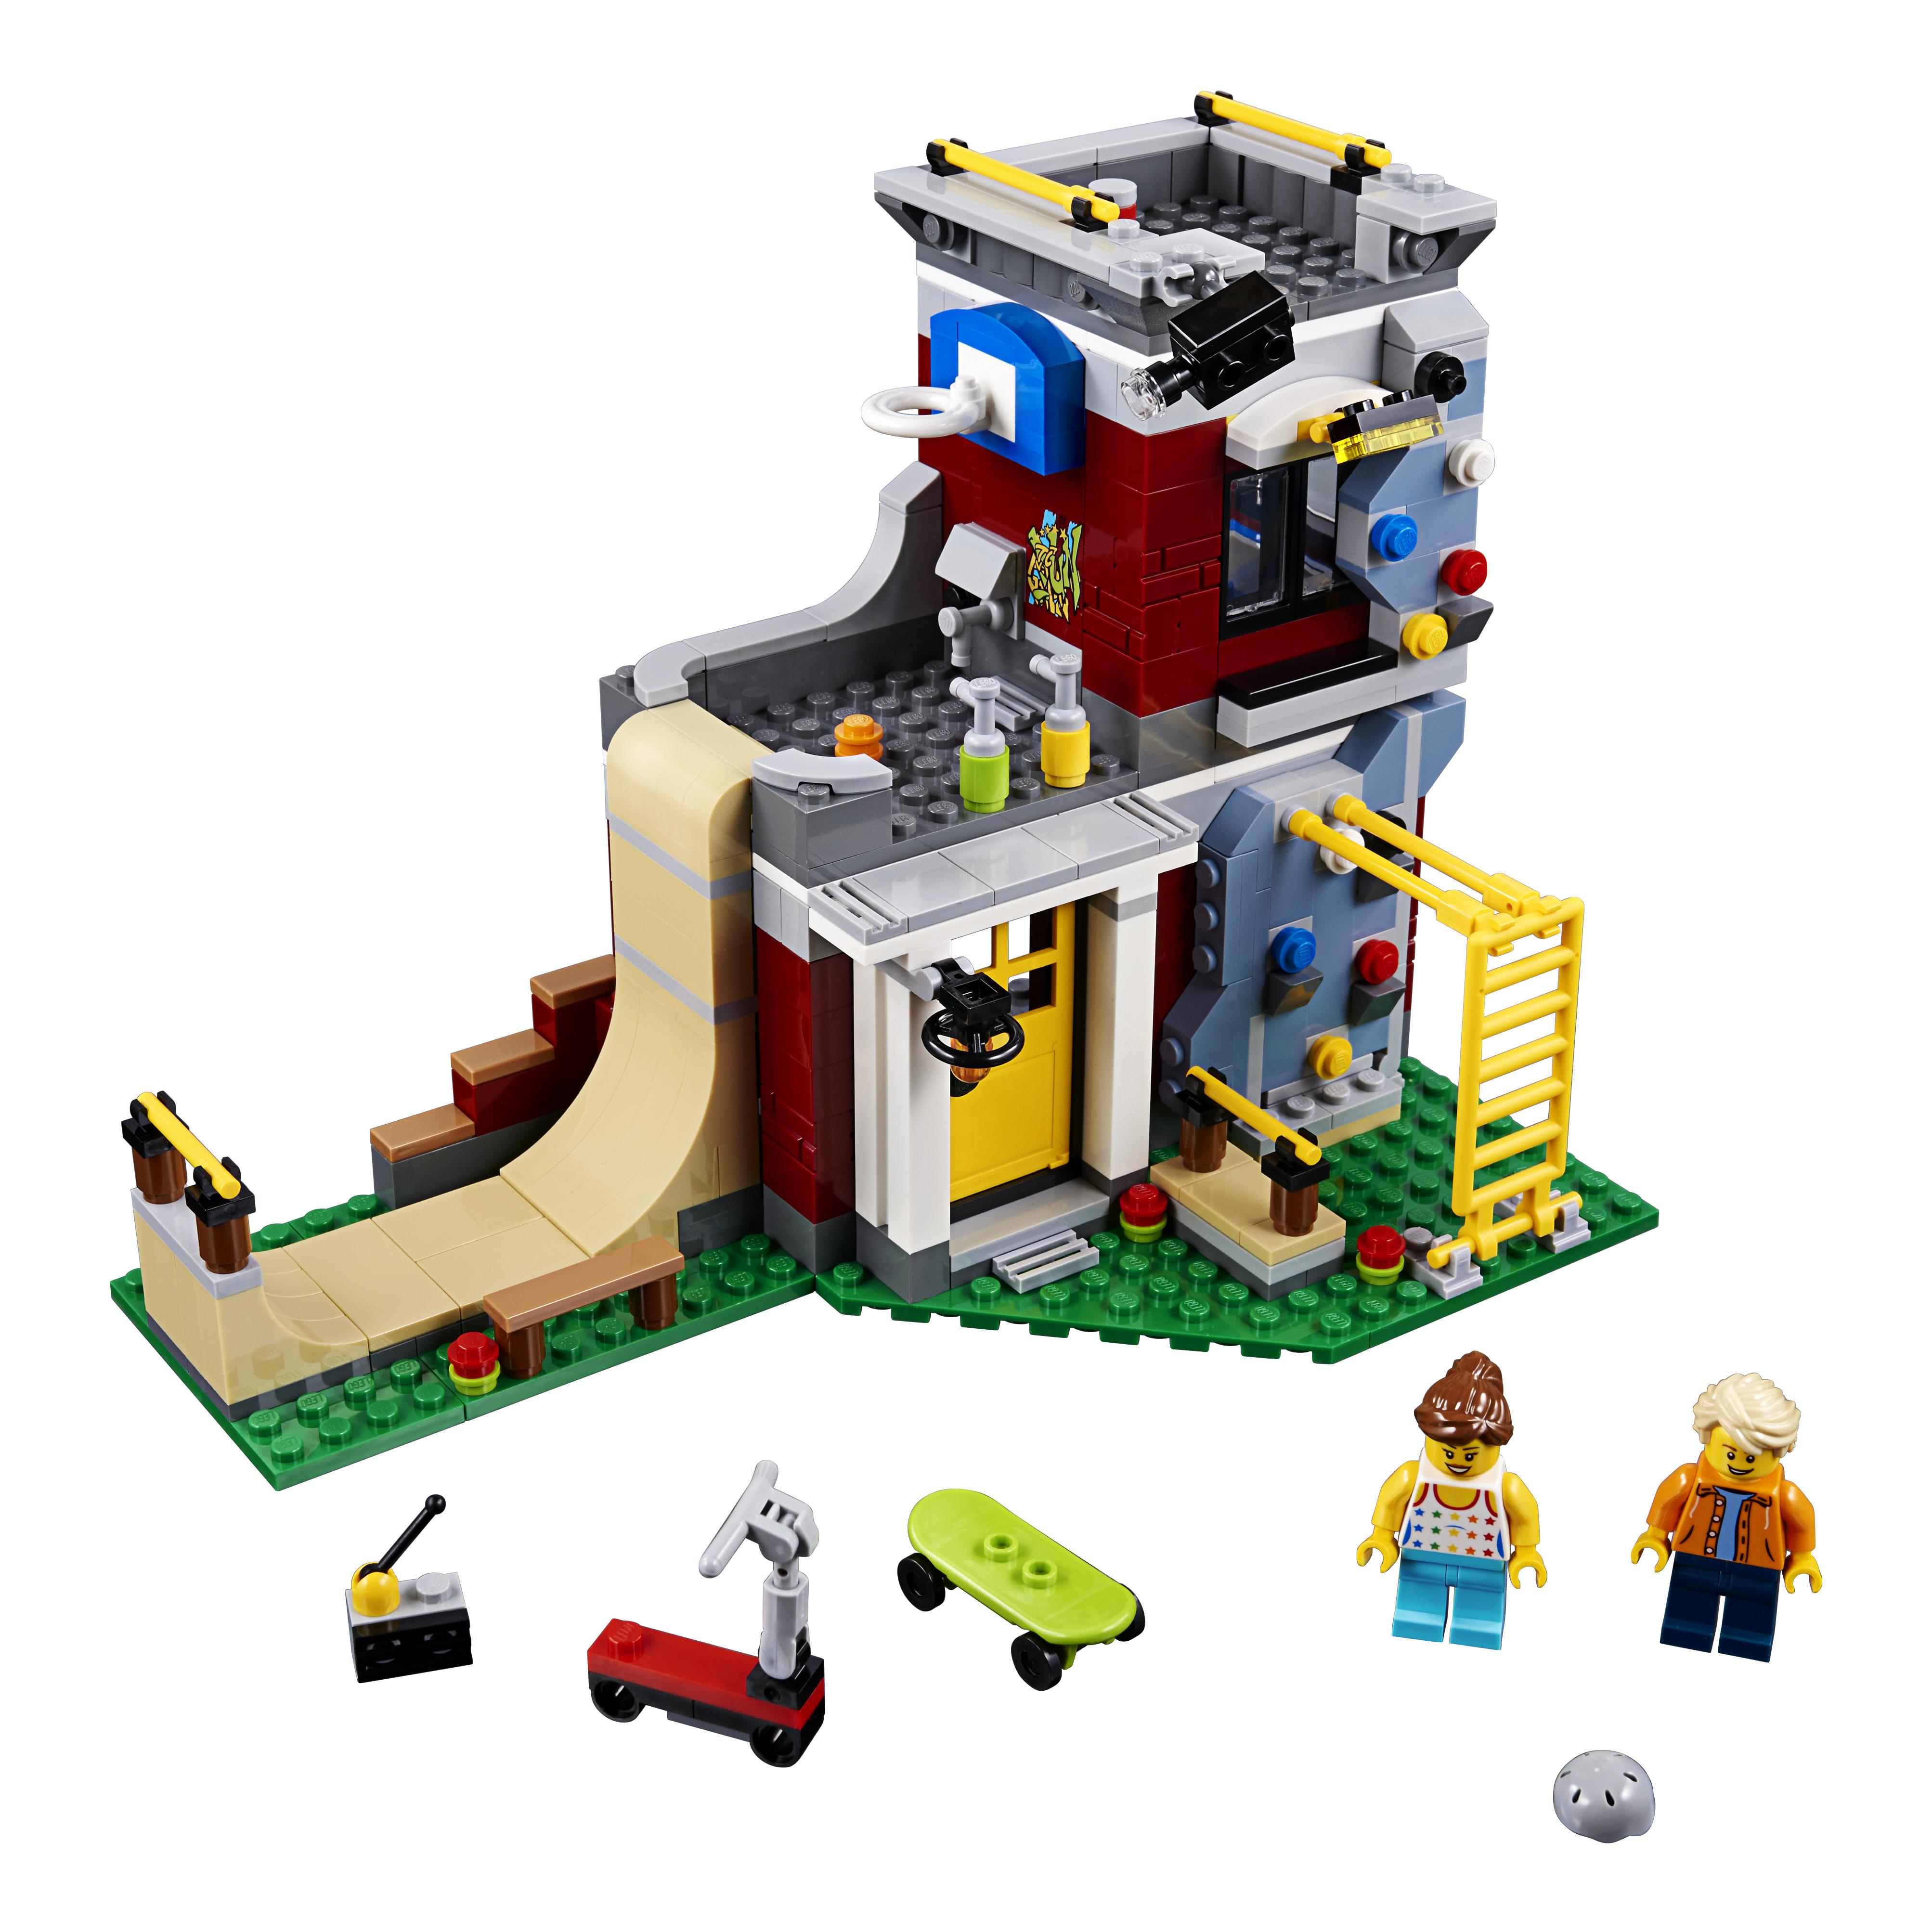 Конструктор LEGO Creator Скейт-площадка (модульная сборка) (31081) фото